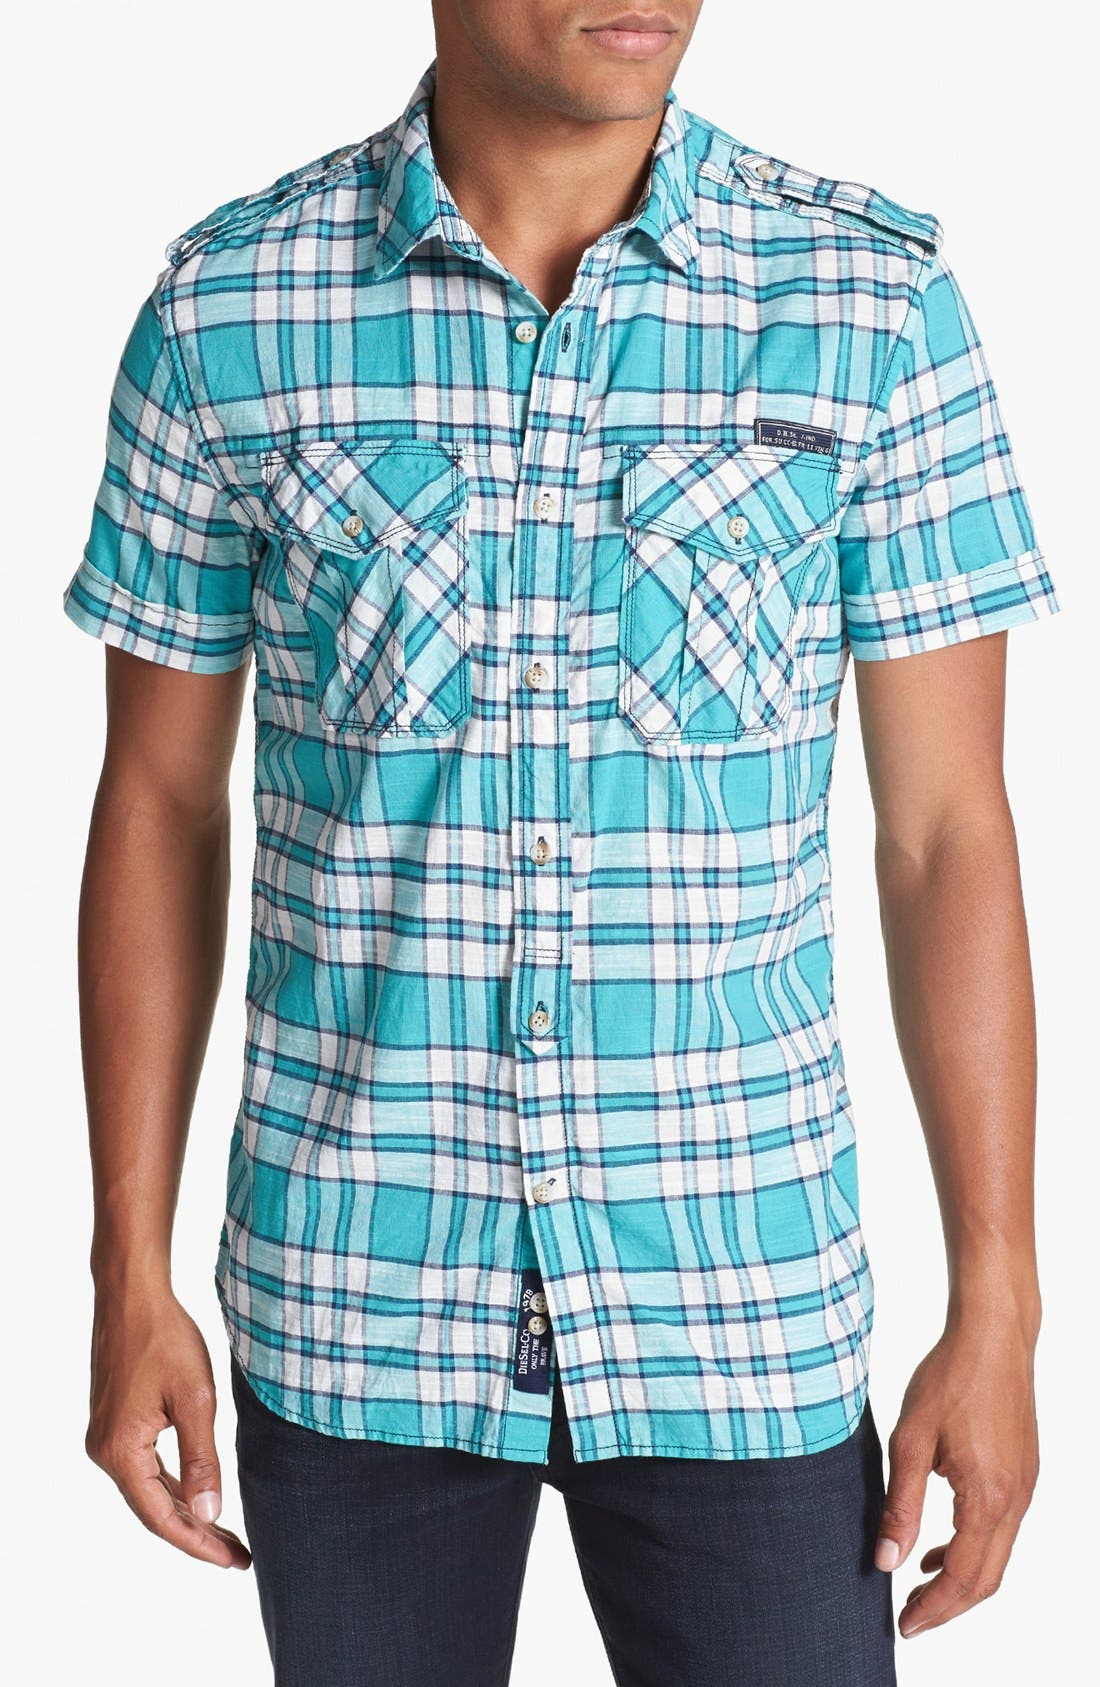 Main Image - DIESEL® 'Sadela' Yarn Dyed Check Woven Shirt